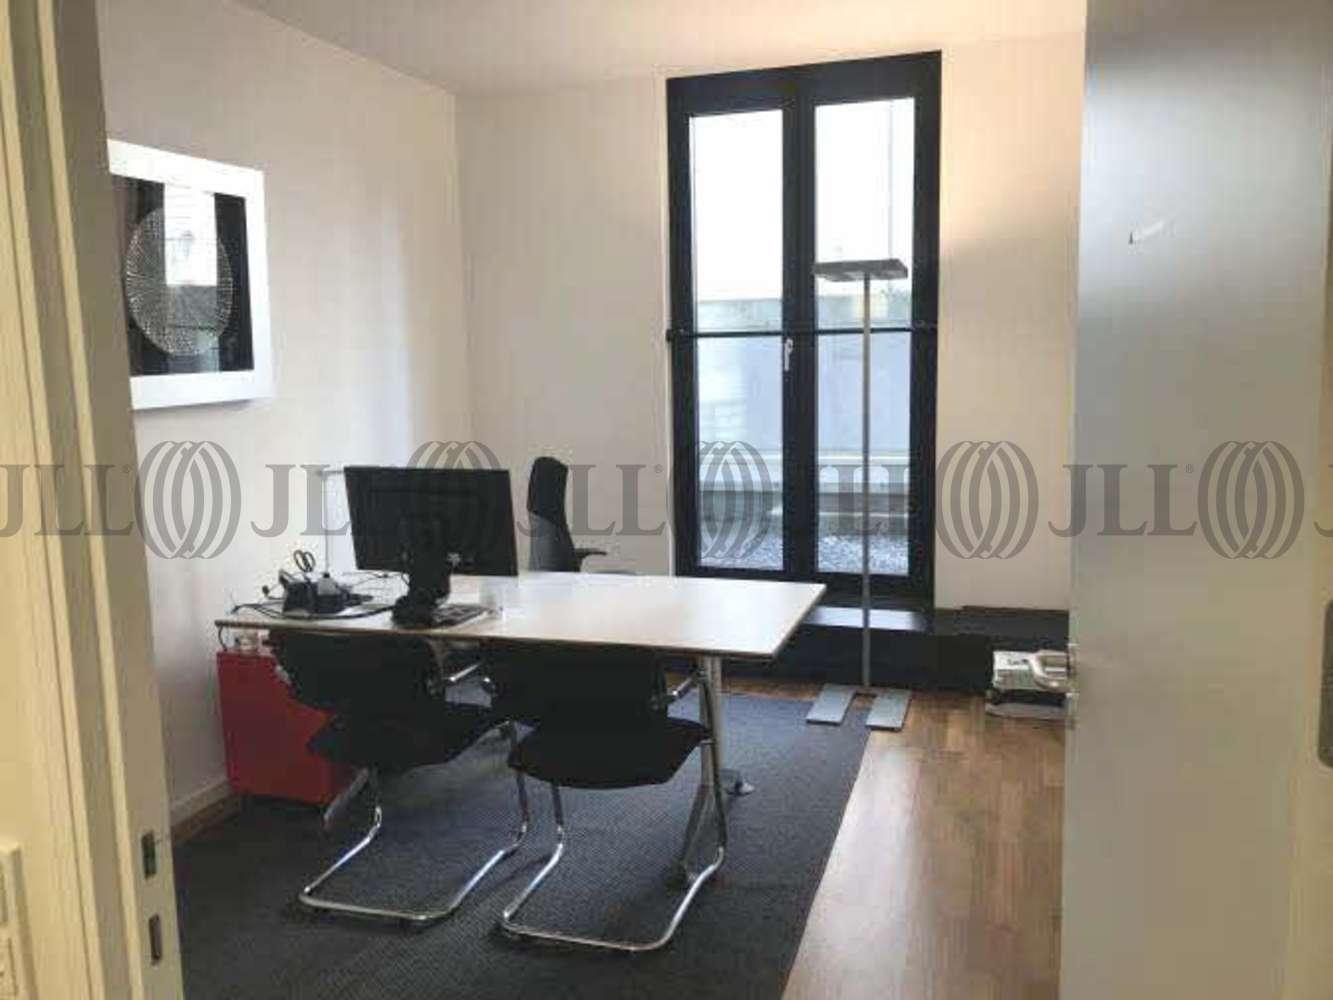 Büros Frankfurt am main, 60329 - Büro - Frankfurt am Main, Bahnhofsviertel - F0050 - 10890335